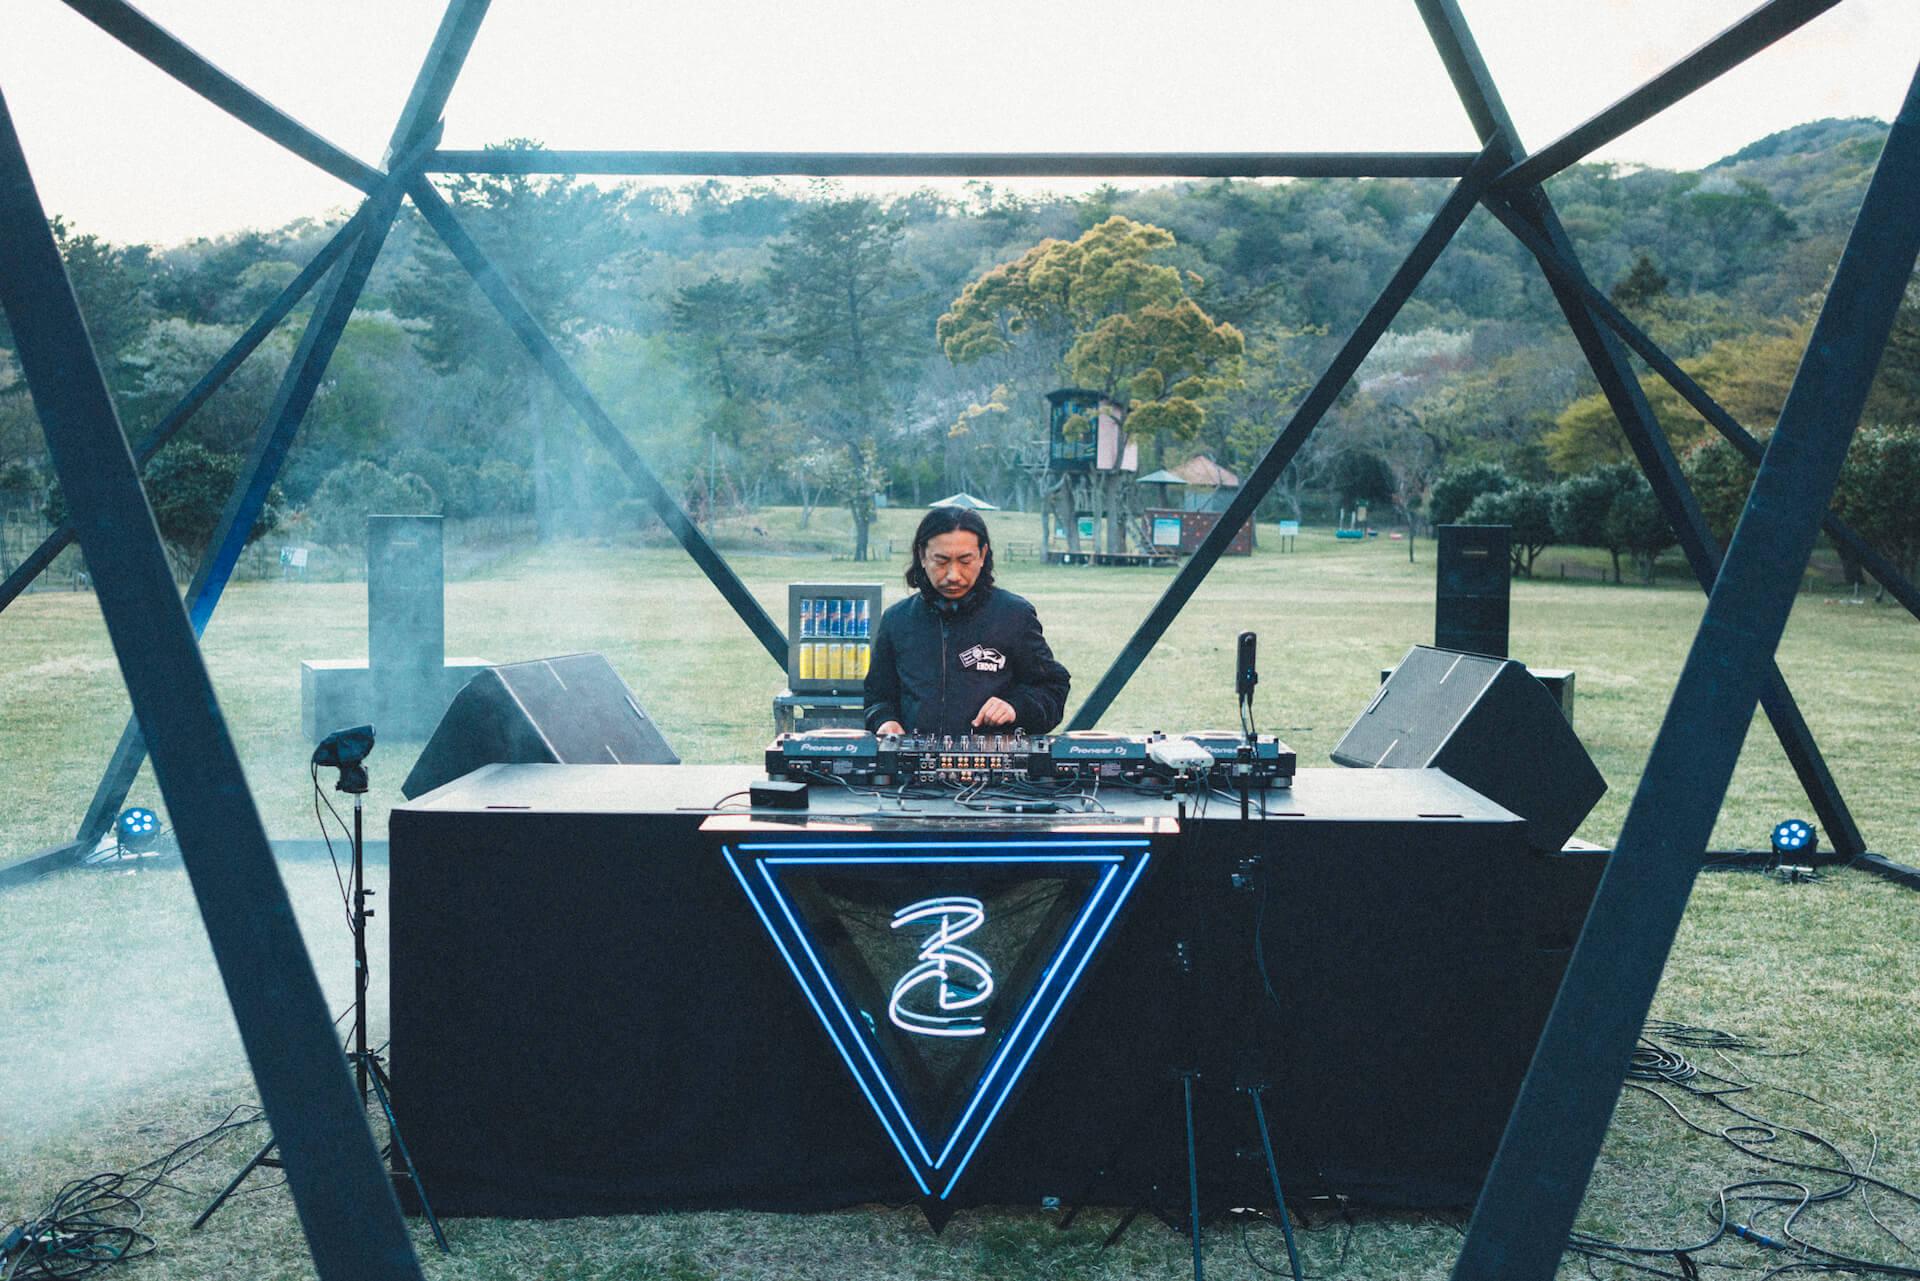 <RAINBOW DISCO CLUB>が初の野外オールナイト&7年ぶり都市型パーティーに!DJ Nobu、Wata Igarashi、Licaxxx、Sauce81ら第1弾ラインナップ発表 music210318_rdc2021_3